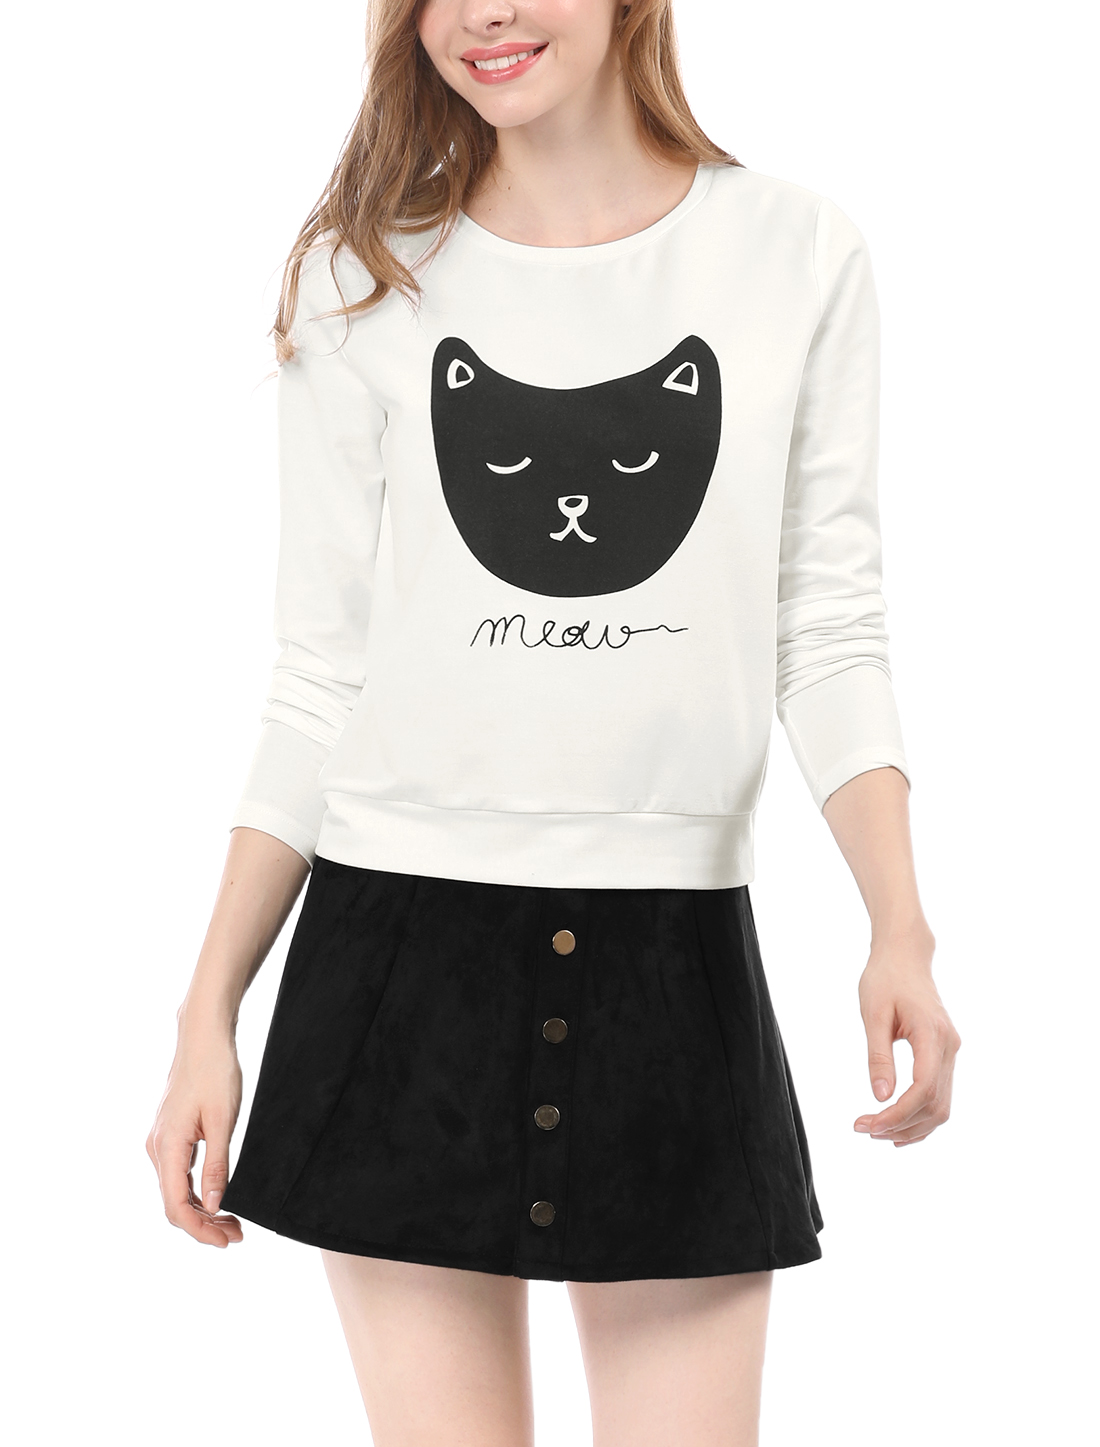 Allegra K Women Cat Prints Round Neck Long Sleeves Top Shirt White S